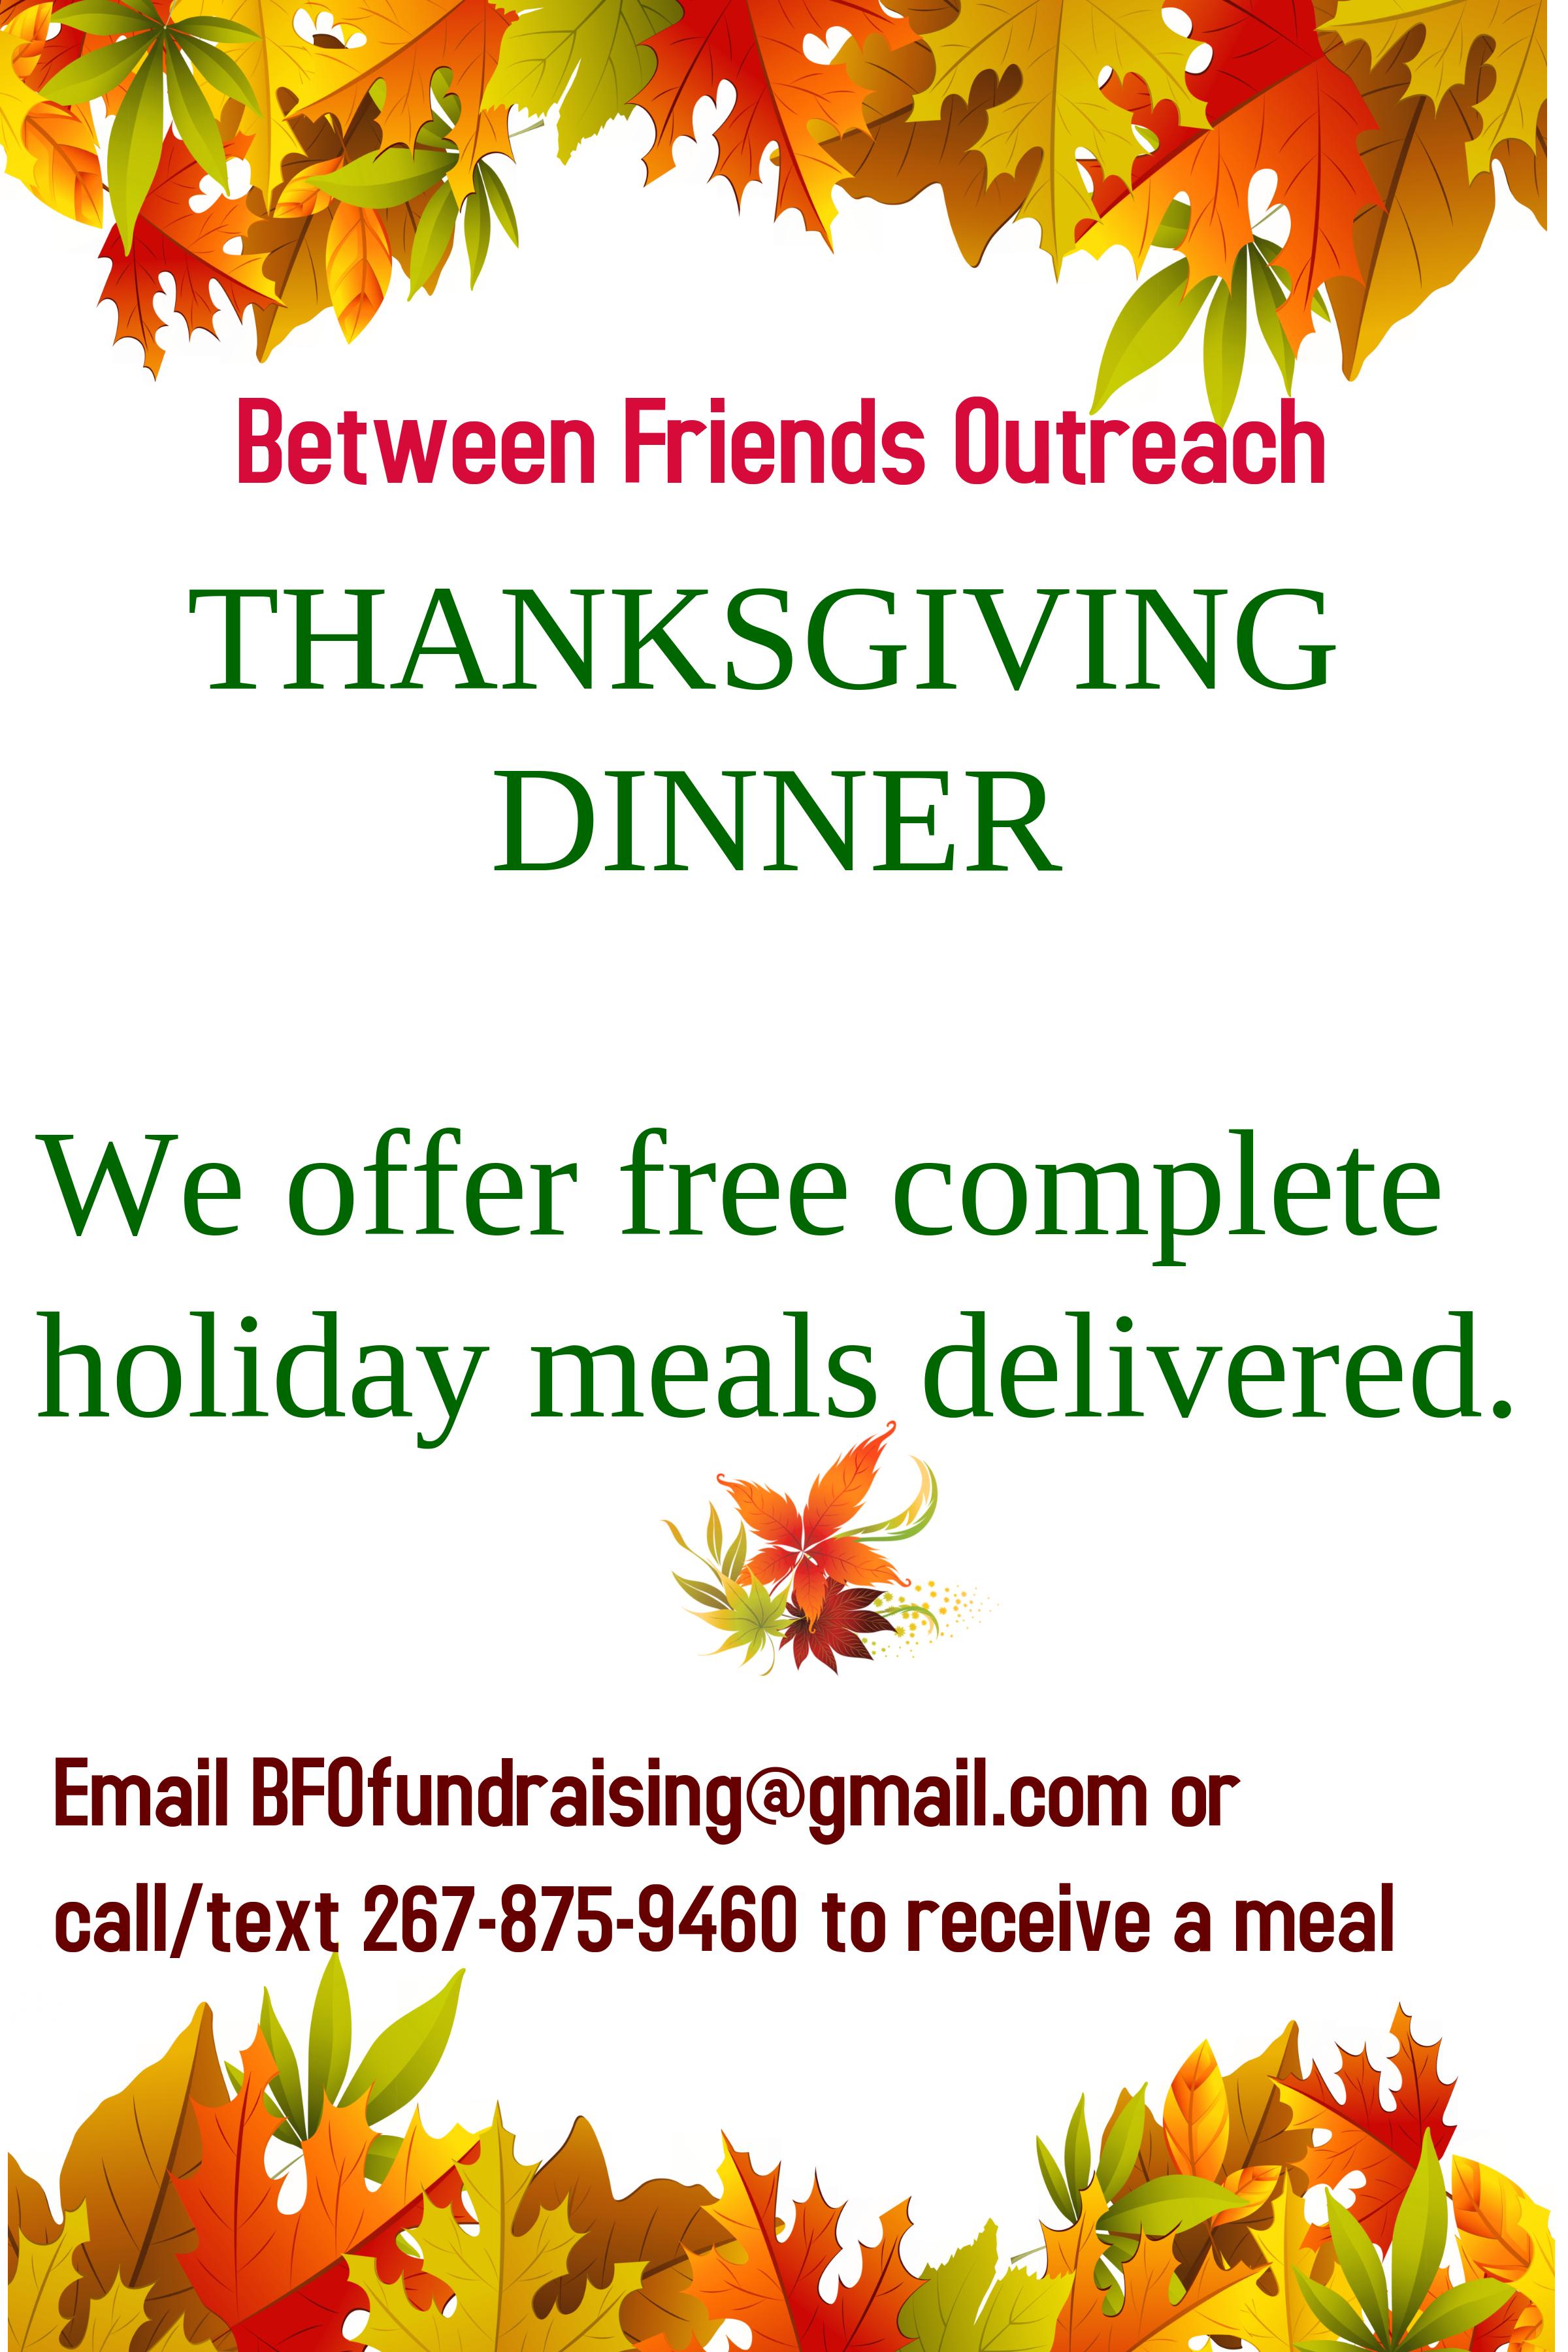 Copy of Thanksgiving Dinner.jpg